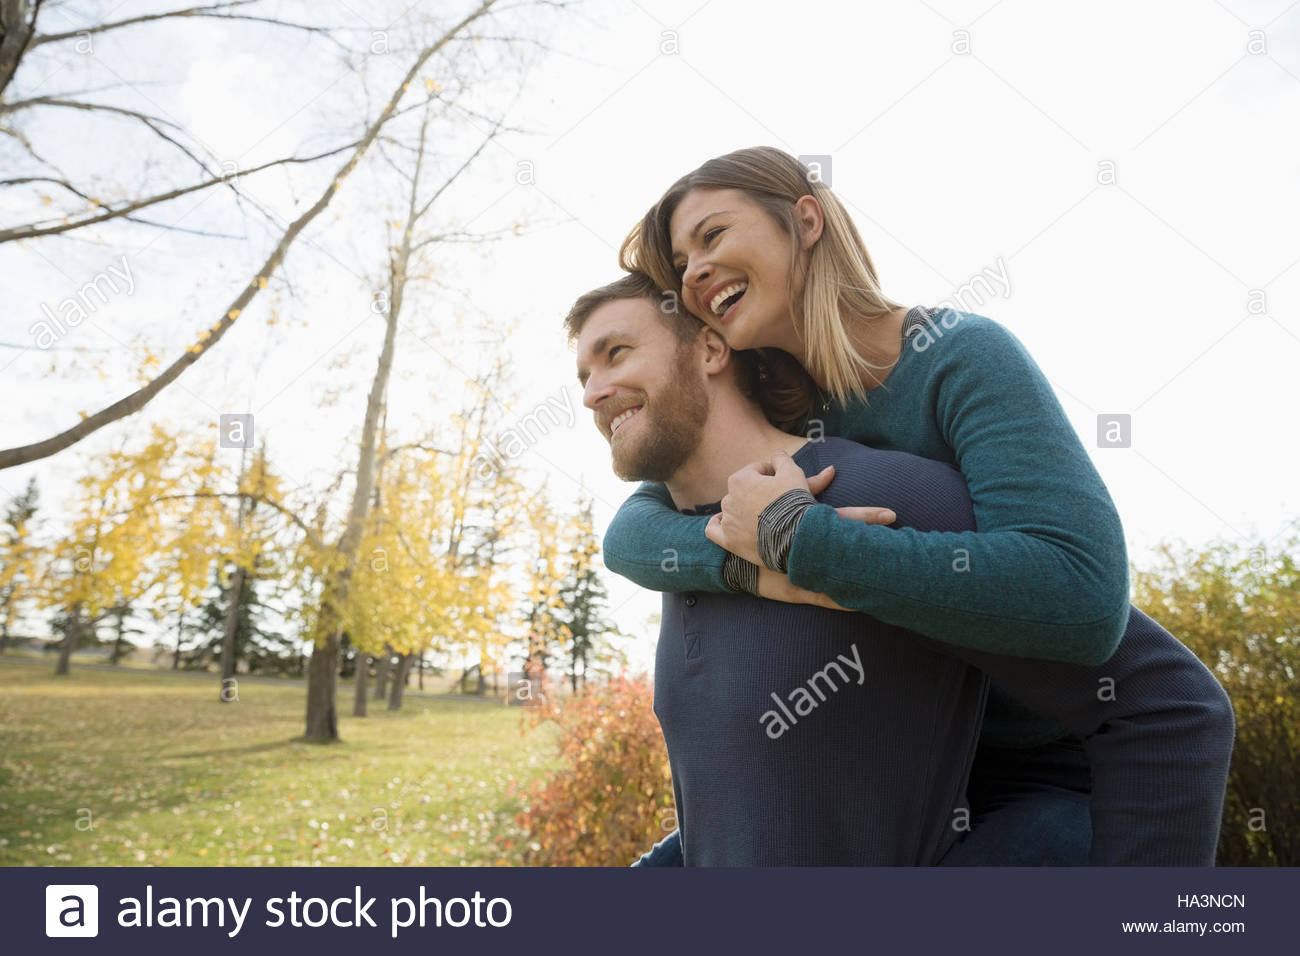 Feliz pareja sumarse en otoño park Imagen De Stock